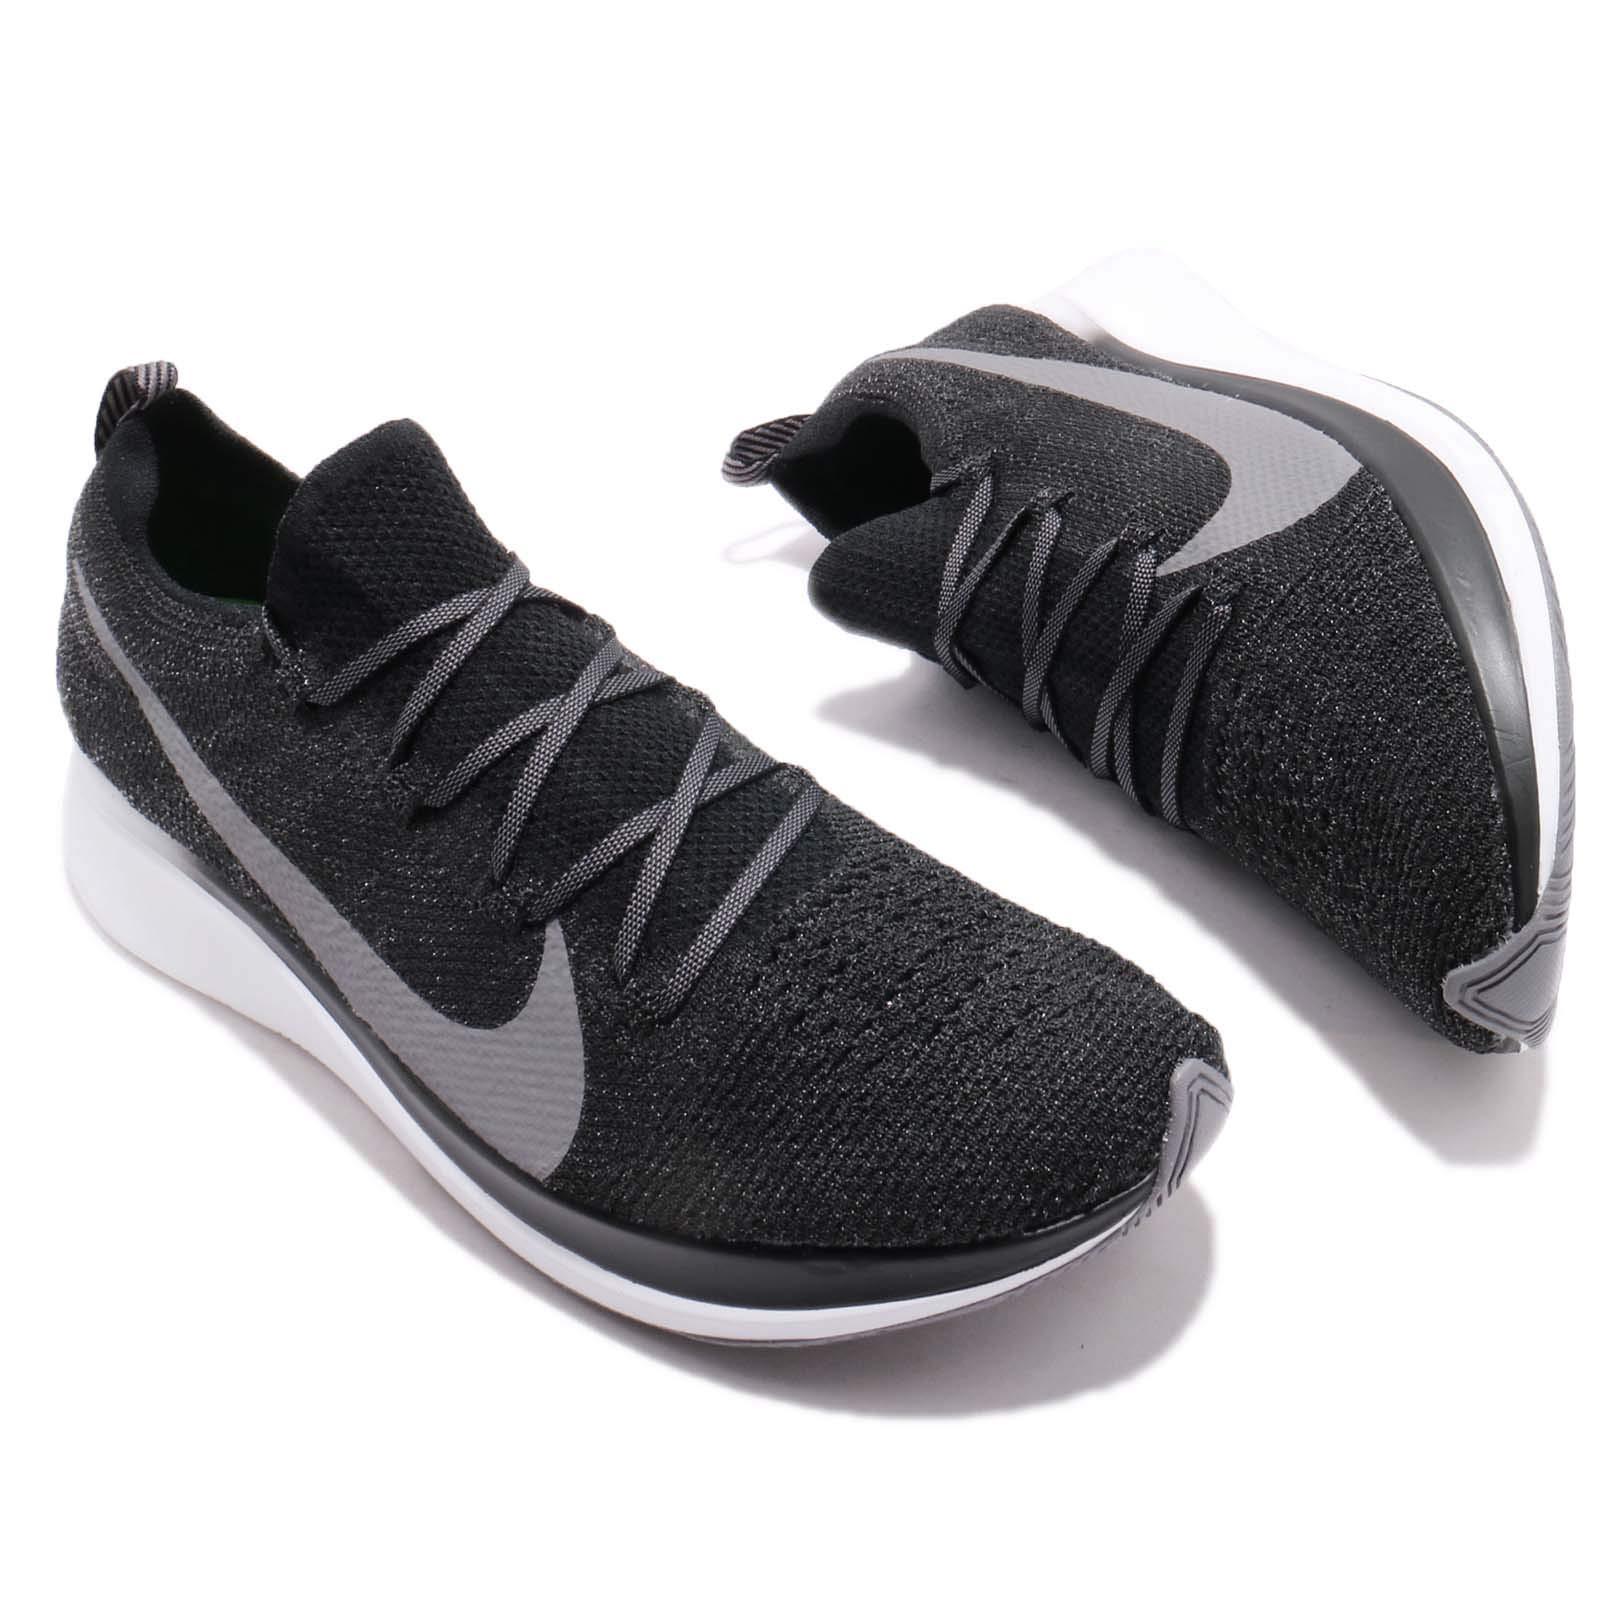 Nike Zoom Fly Flyknit Men's Running Shoe Black/Gunsmoke-White Size 7.5 by Nike (Image #7)